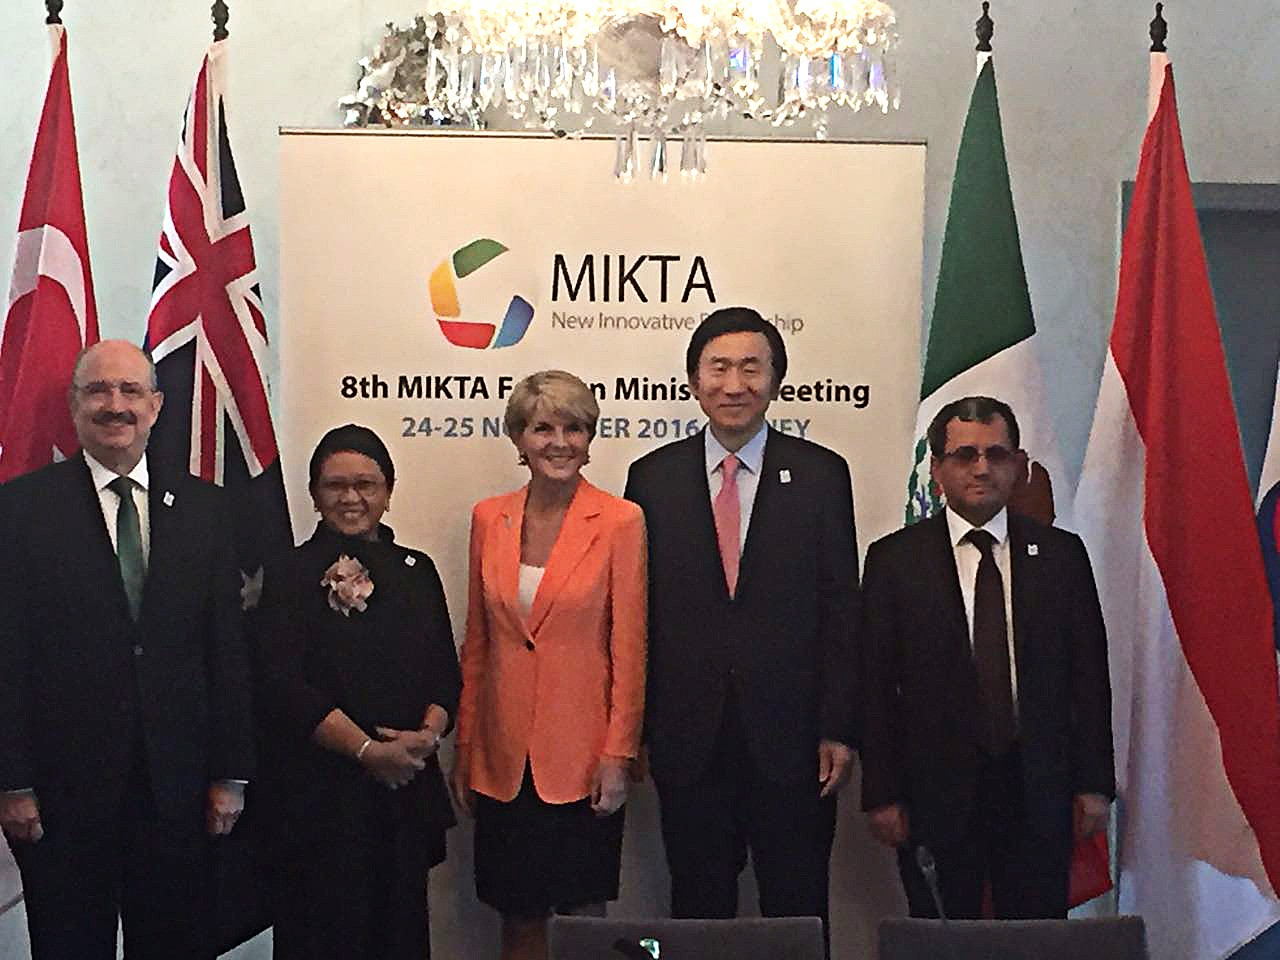 Retno promotes MIKTA cooperation in creative economy